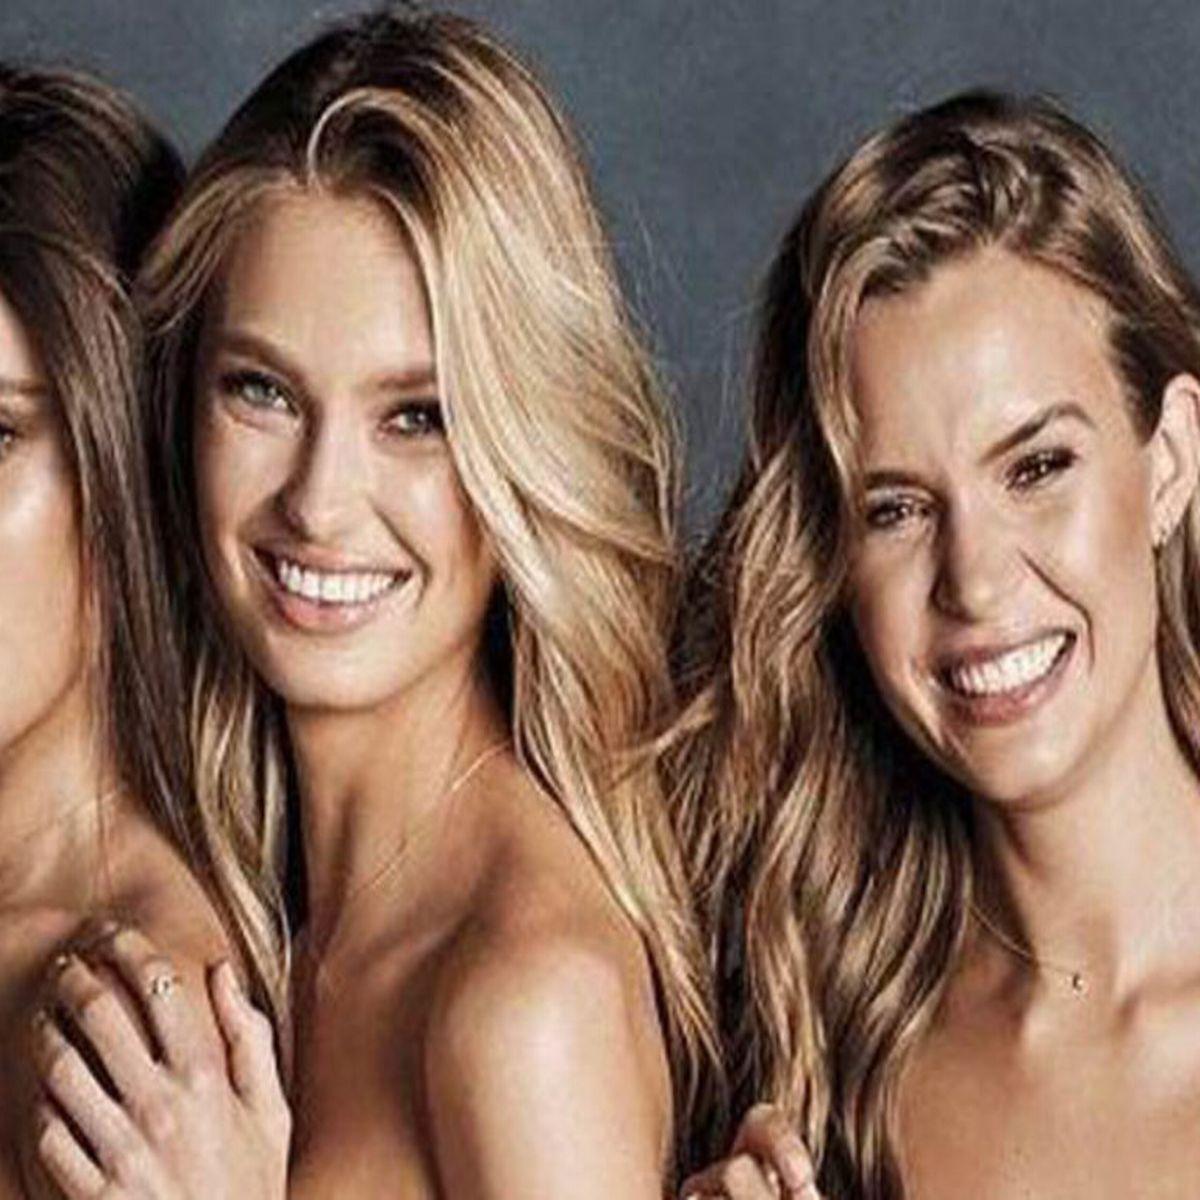 Victorias Secret Models Topless photo 14